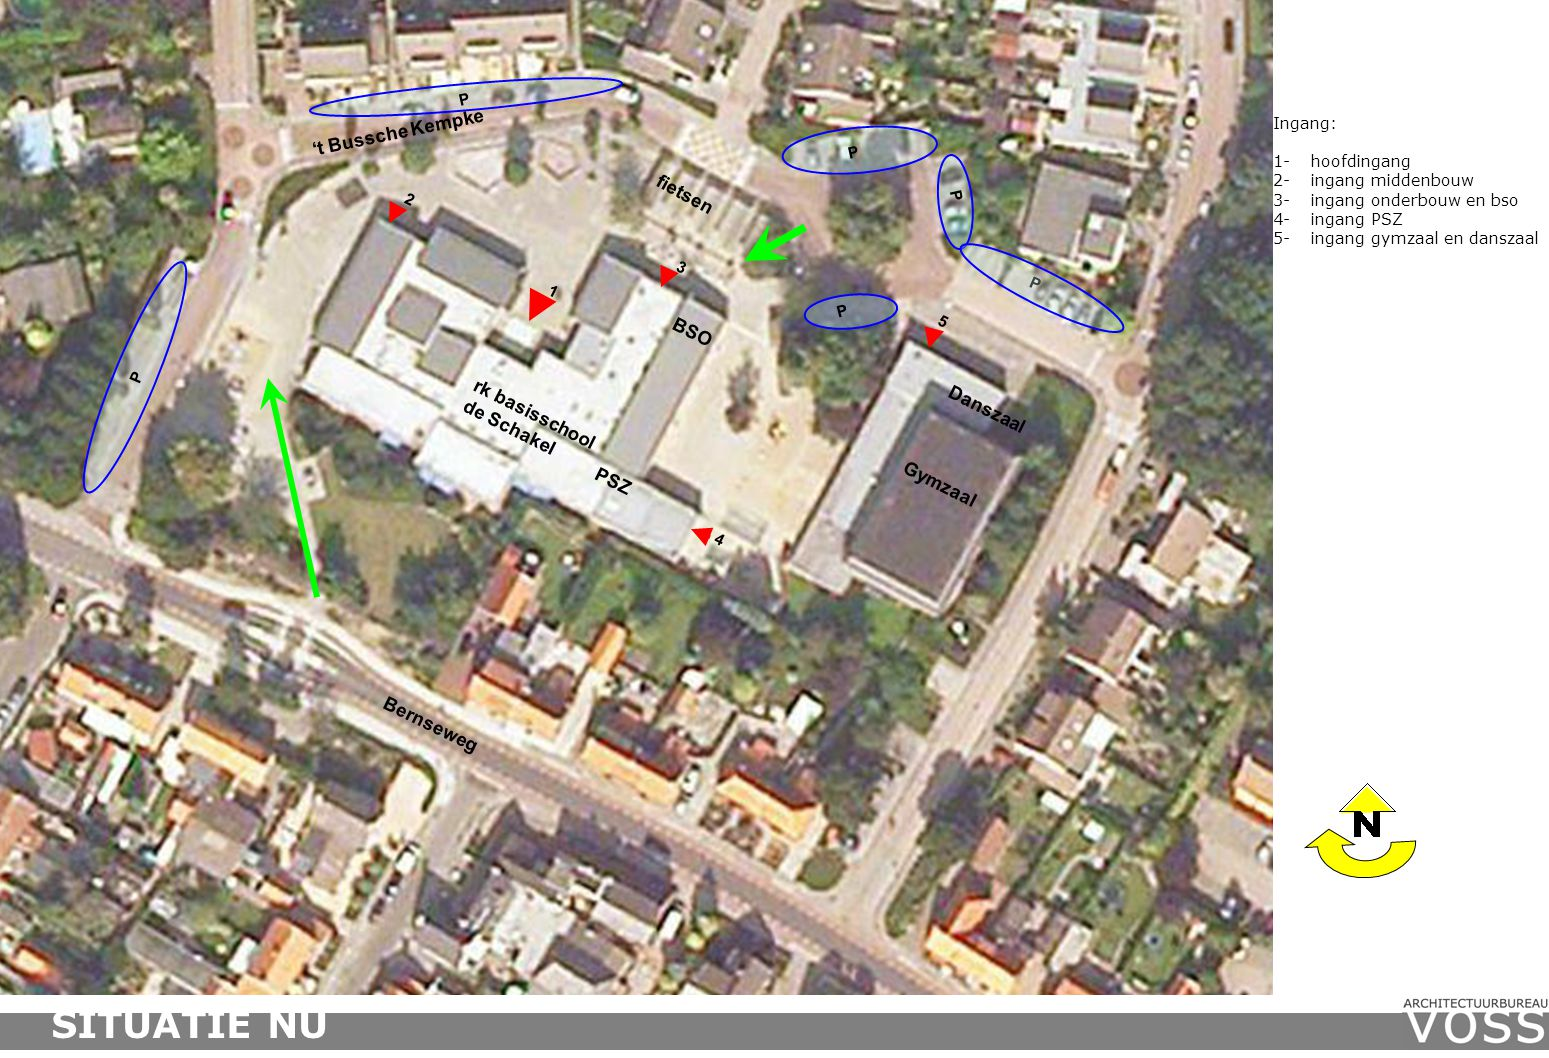 't Bussche Kempke Bernseweg fietsen PSZ rk basisschool de Schakel Gymzaal Ingang: 1-hoofdingang 2-ingang middenbouw 3-ingang onderbouw en bso 4-ingang PSZ 5-ingang gymzaal en danszaal 4 P P P P P 3 1 2 5 BSO Danszaal SITUATIE NU P